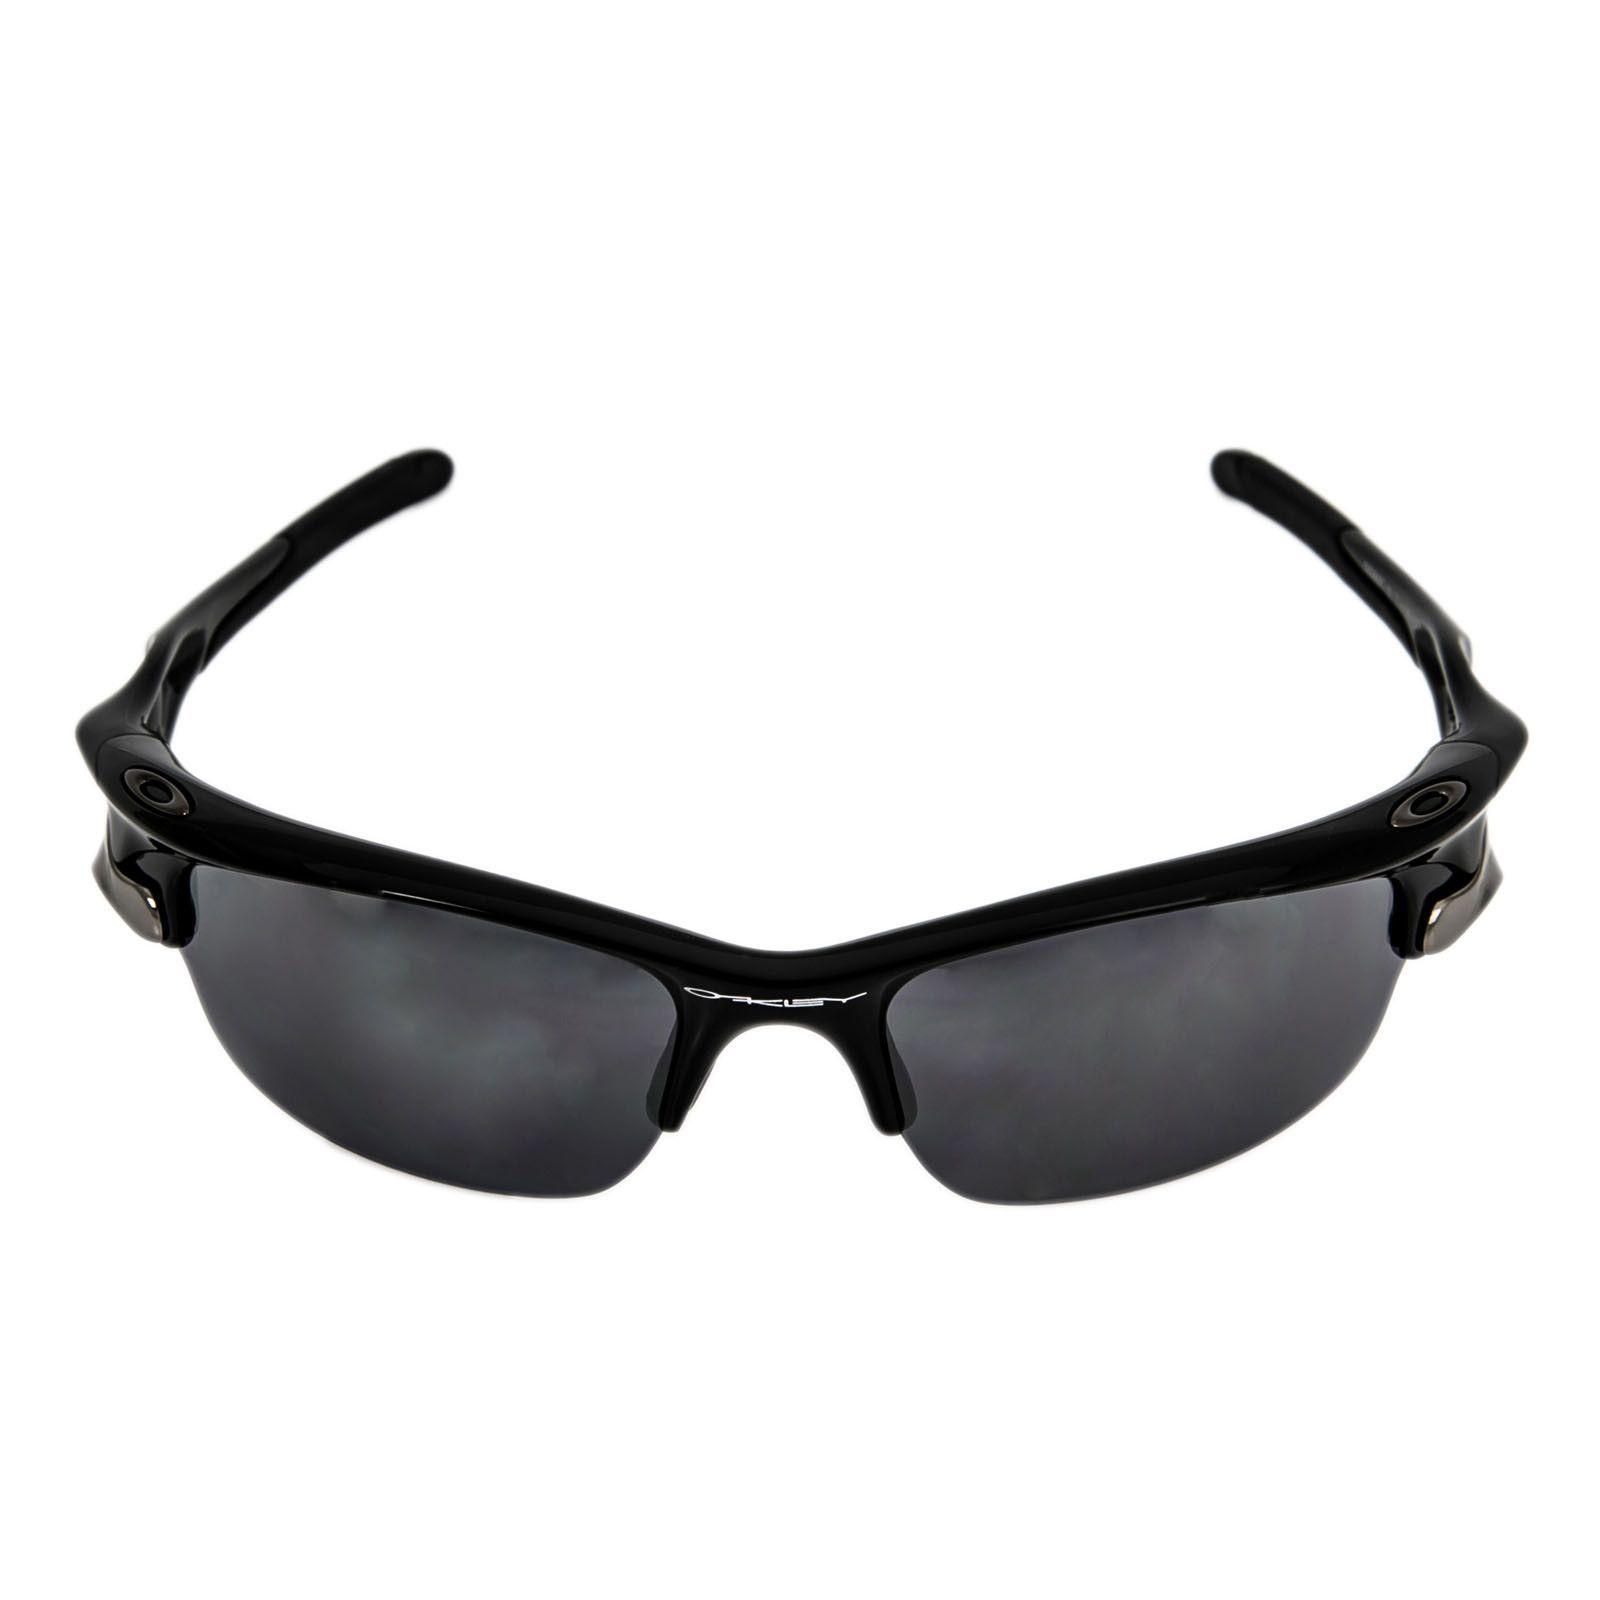 5397a4266f5 Oakley OO9097-16 Men s Fast Jacket XL Polished Black Plastic Frame Black  Iridium   P42 Iridium Lenses Sunglass ...